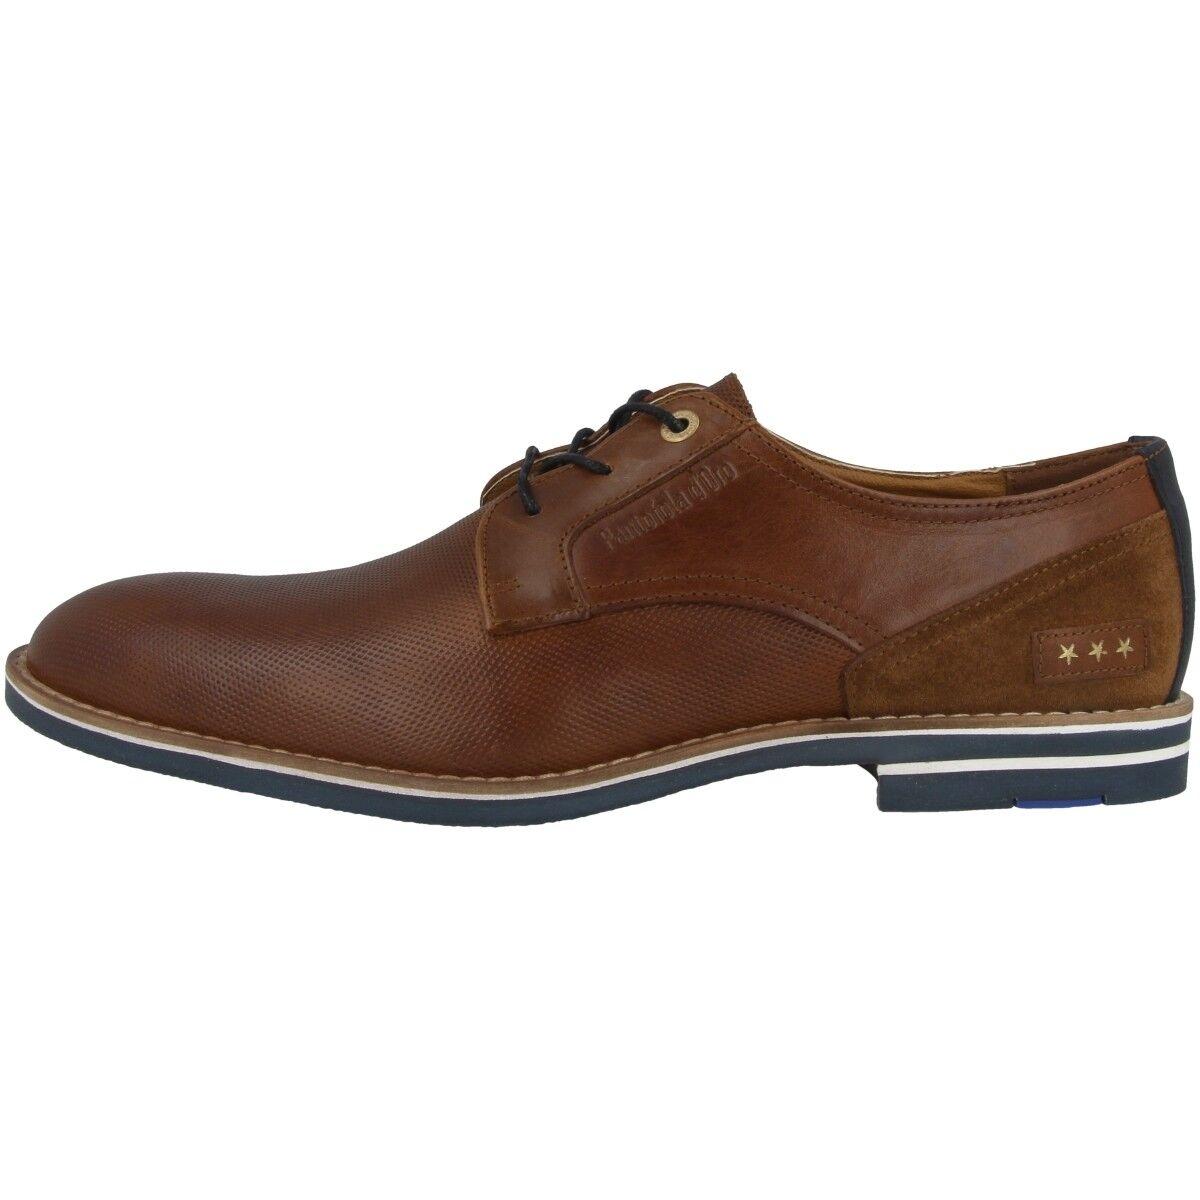 Pantofola D or Lambro hommes Low Chaussures Homme Baskets Loisirs 10191001.JCU